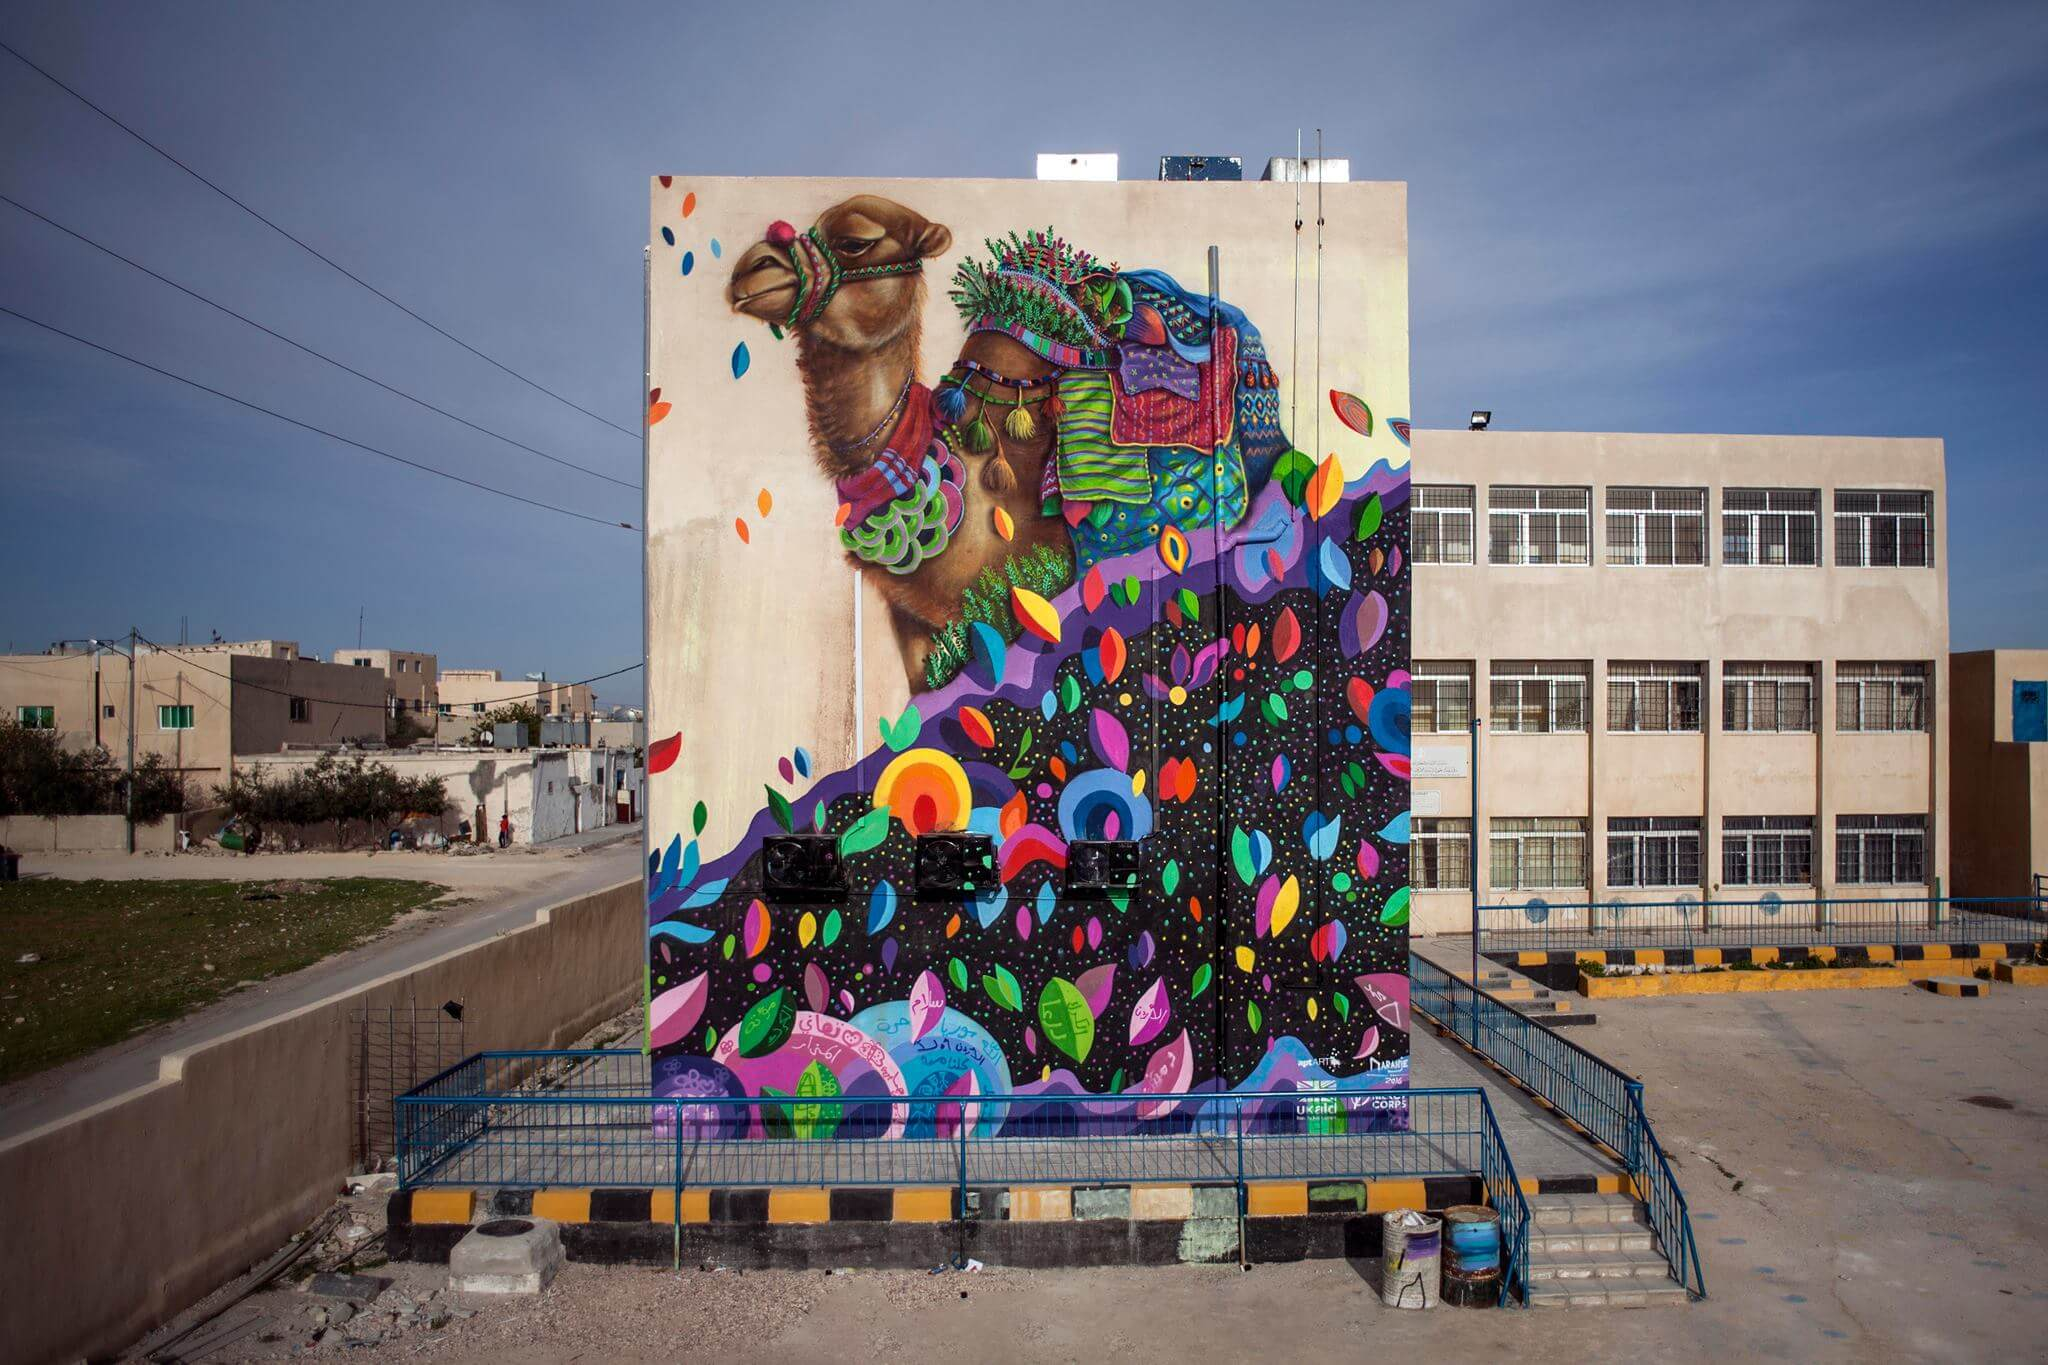 Street artist Ernesto Maranje brings his colourful animals to Jordan, 2016